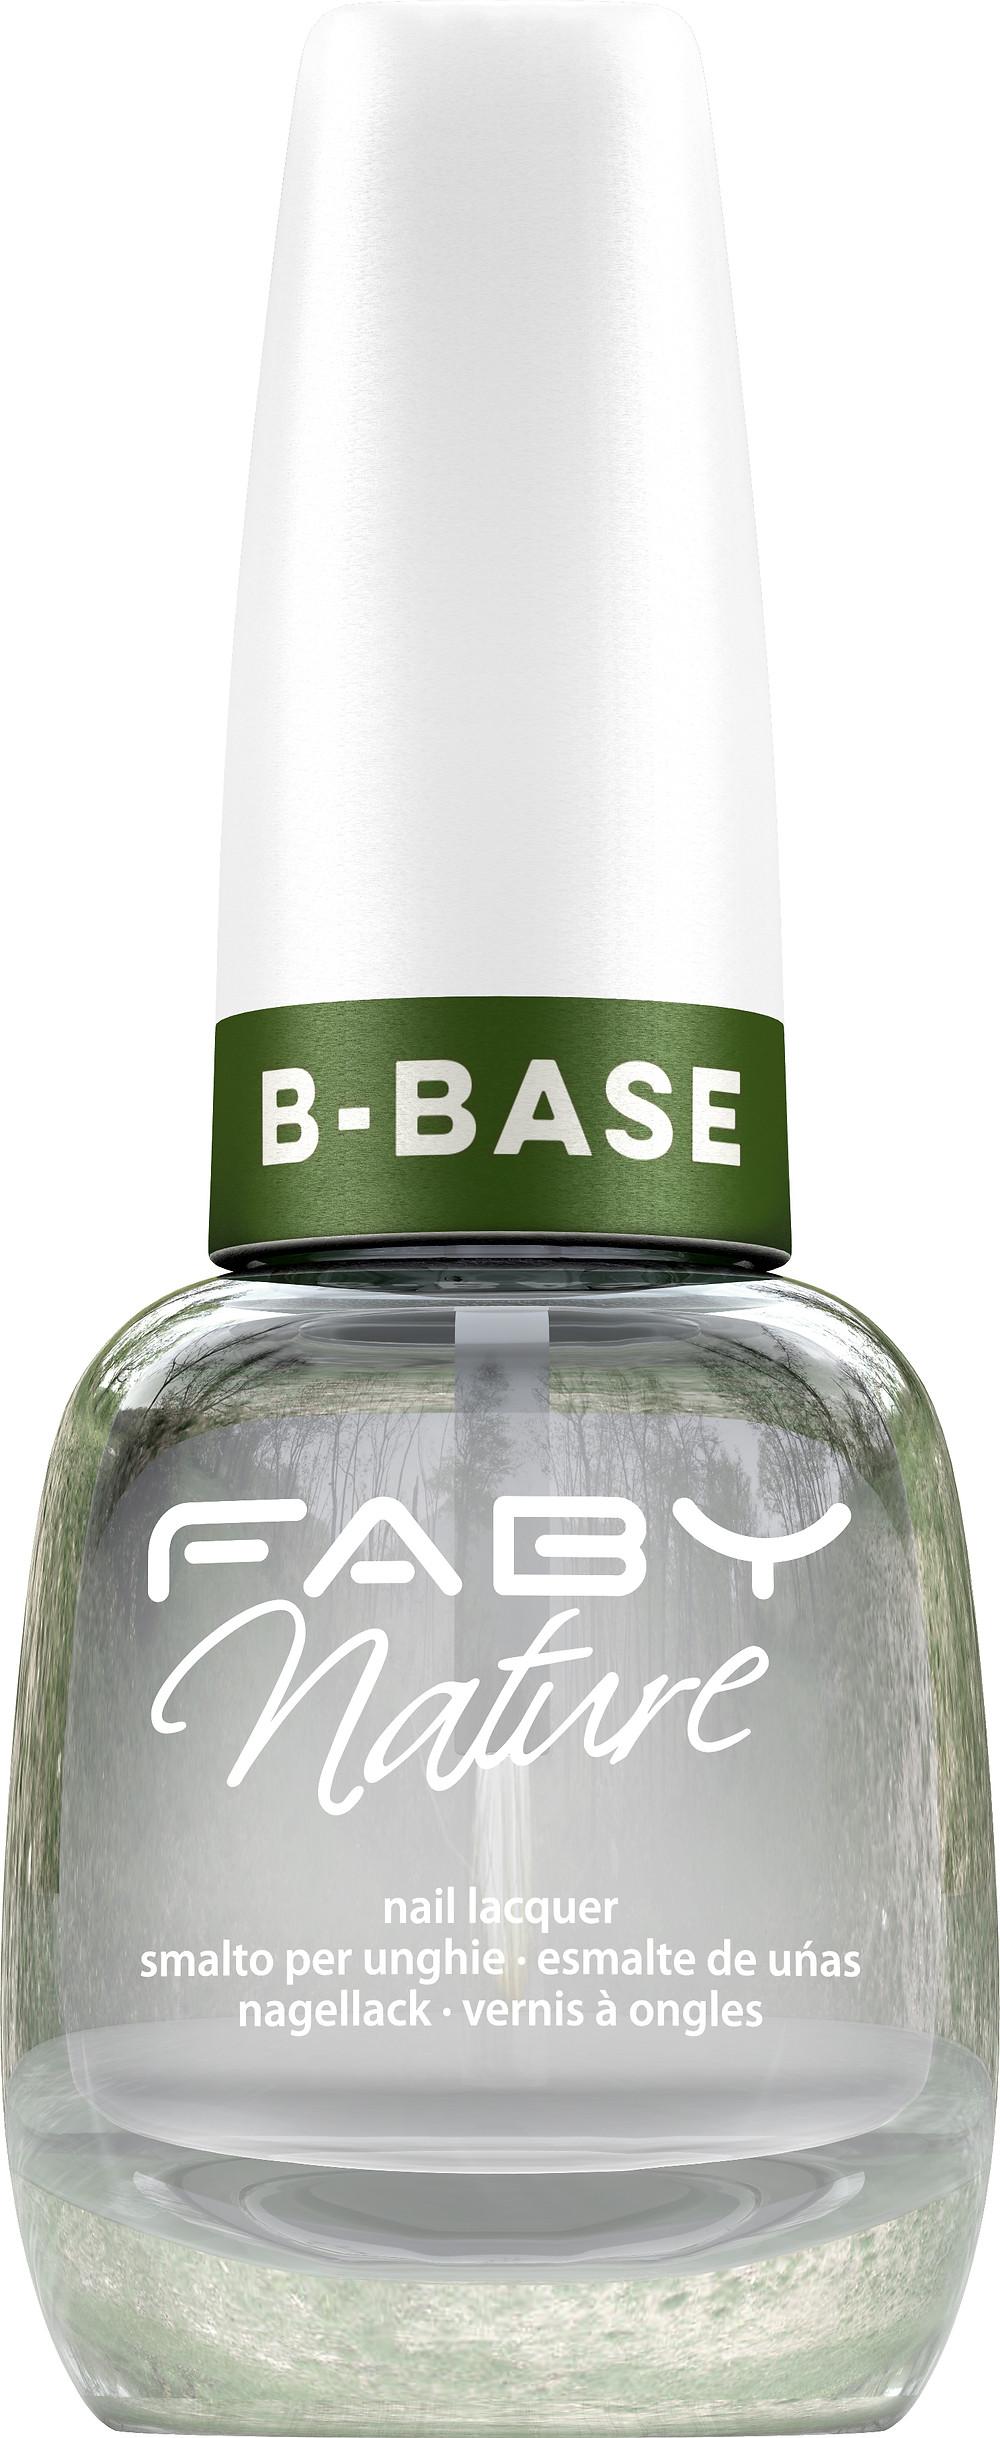 Base de uñas Faby Nature